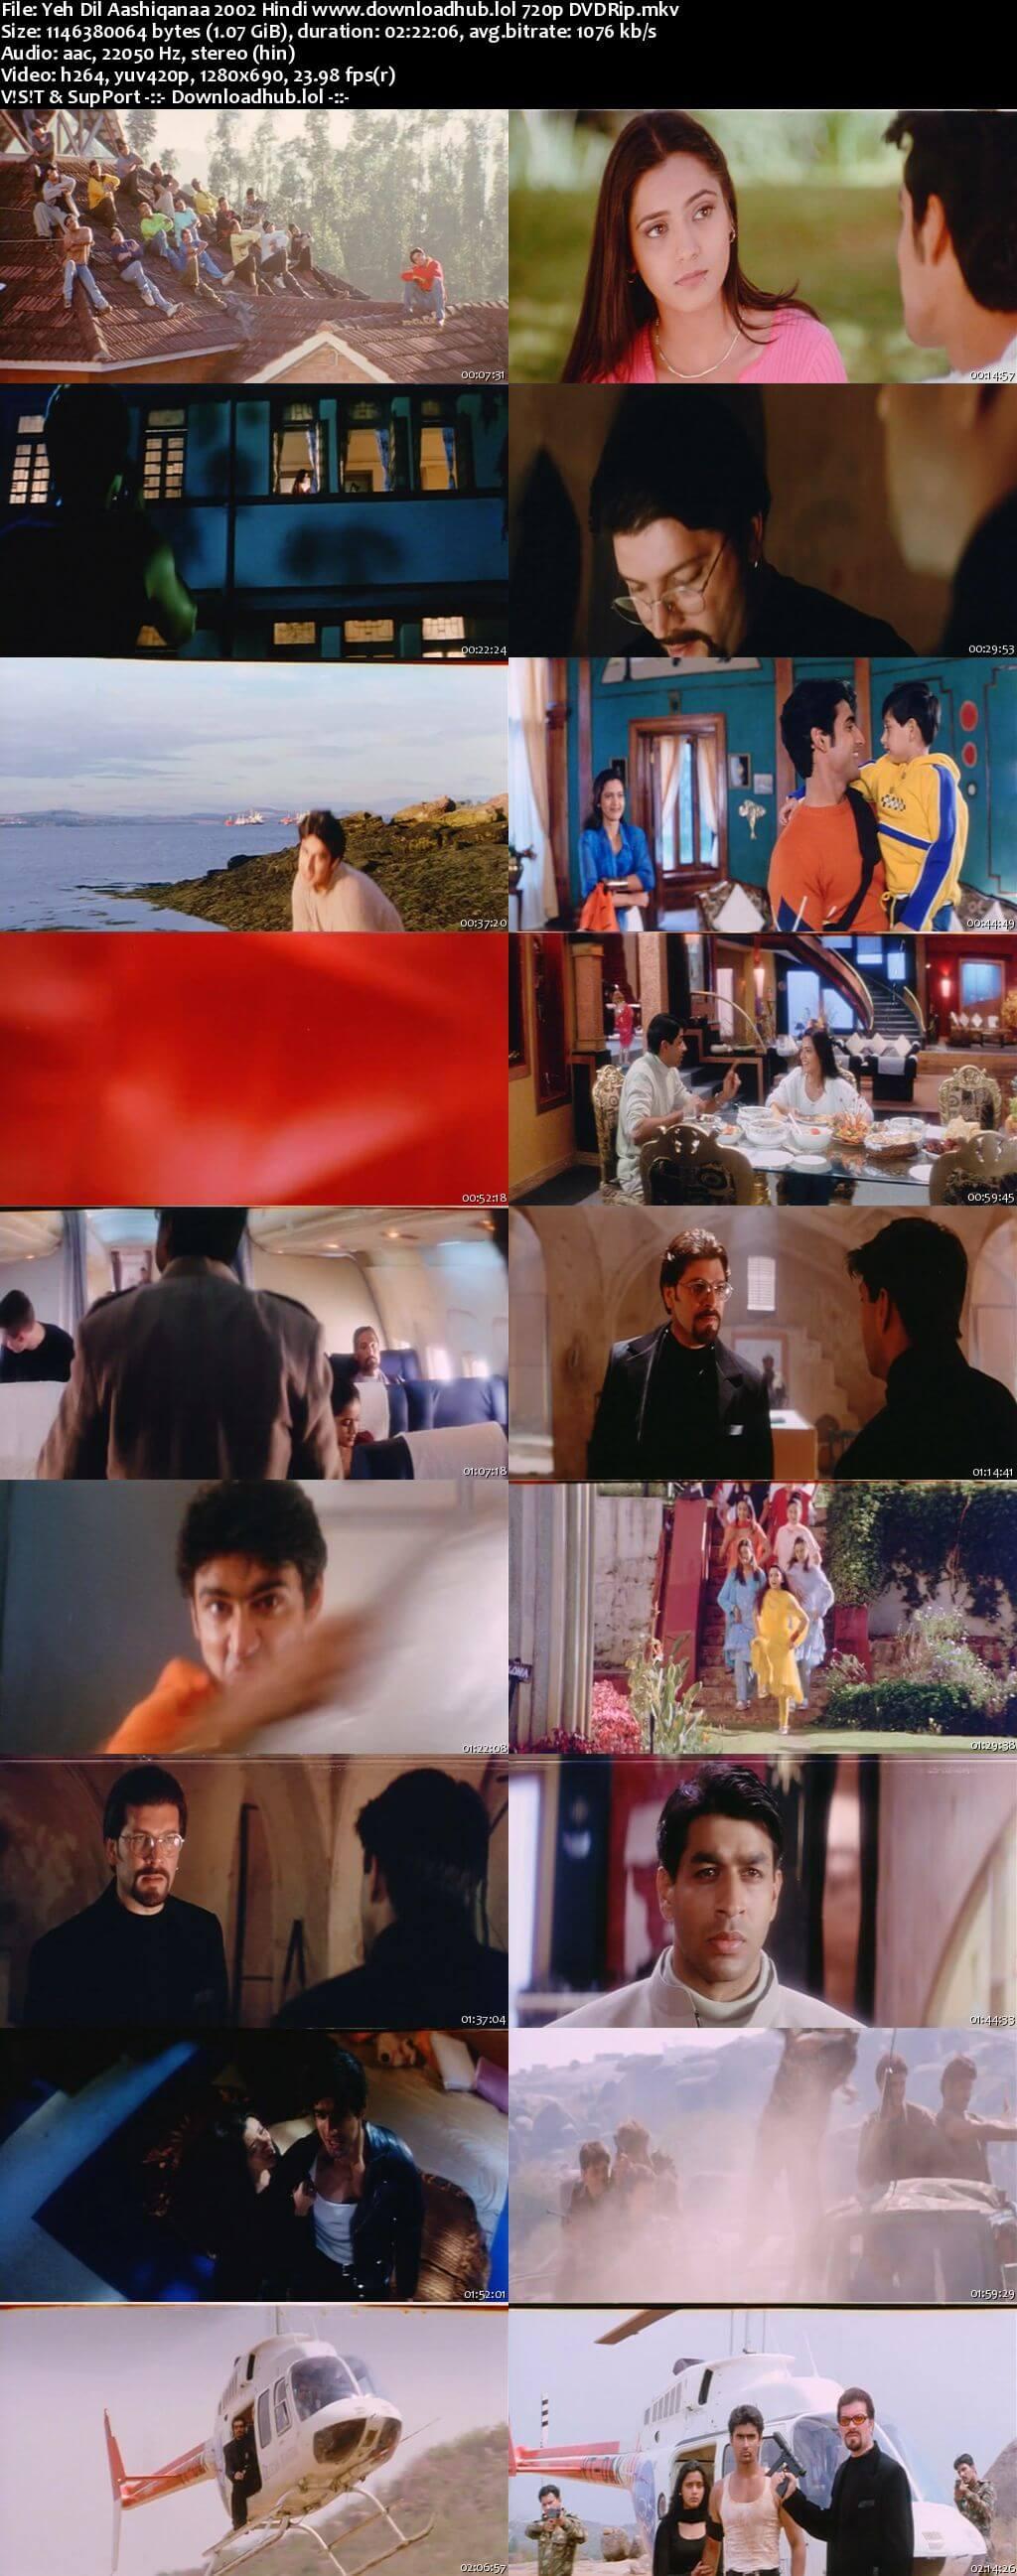 Yeh Dil Aashiqanaa 2002 Hindi 720p DVDRip x264